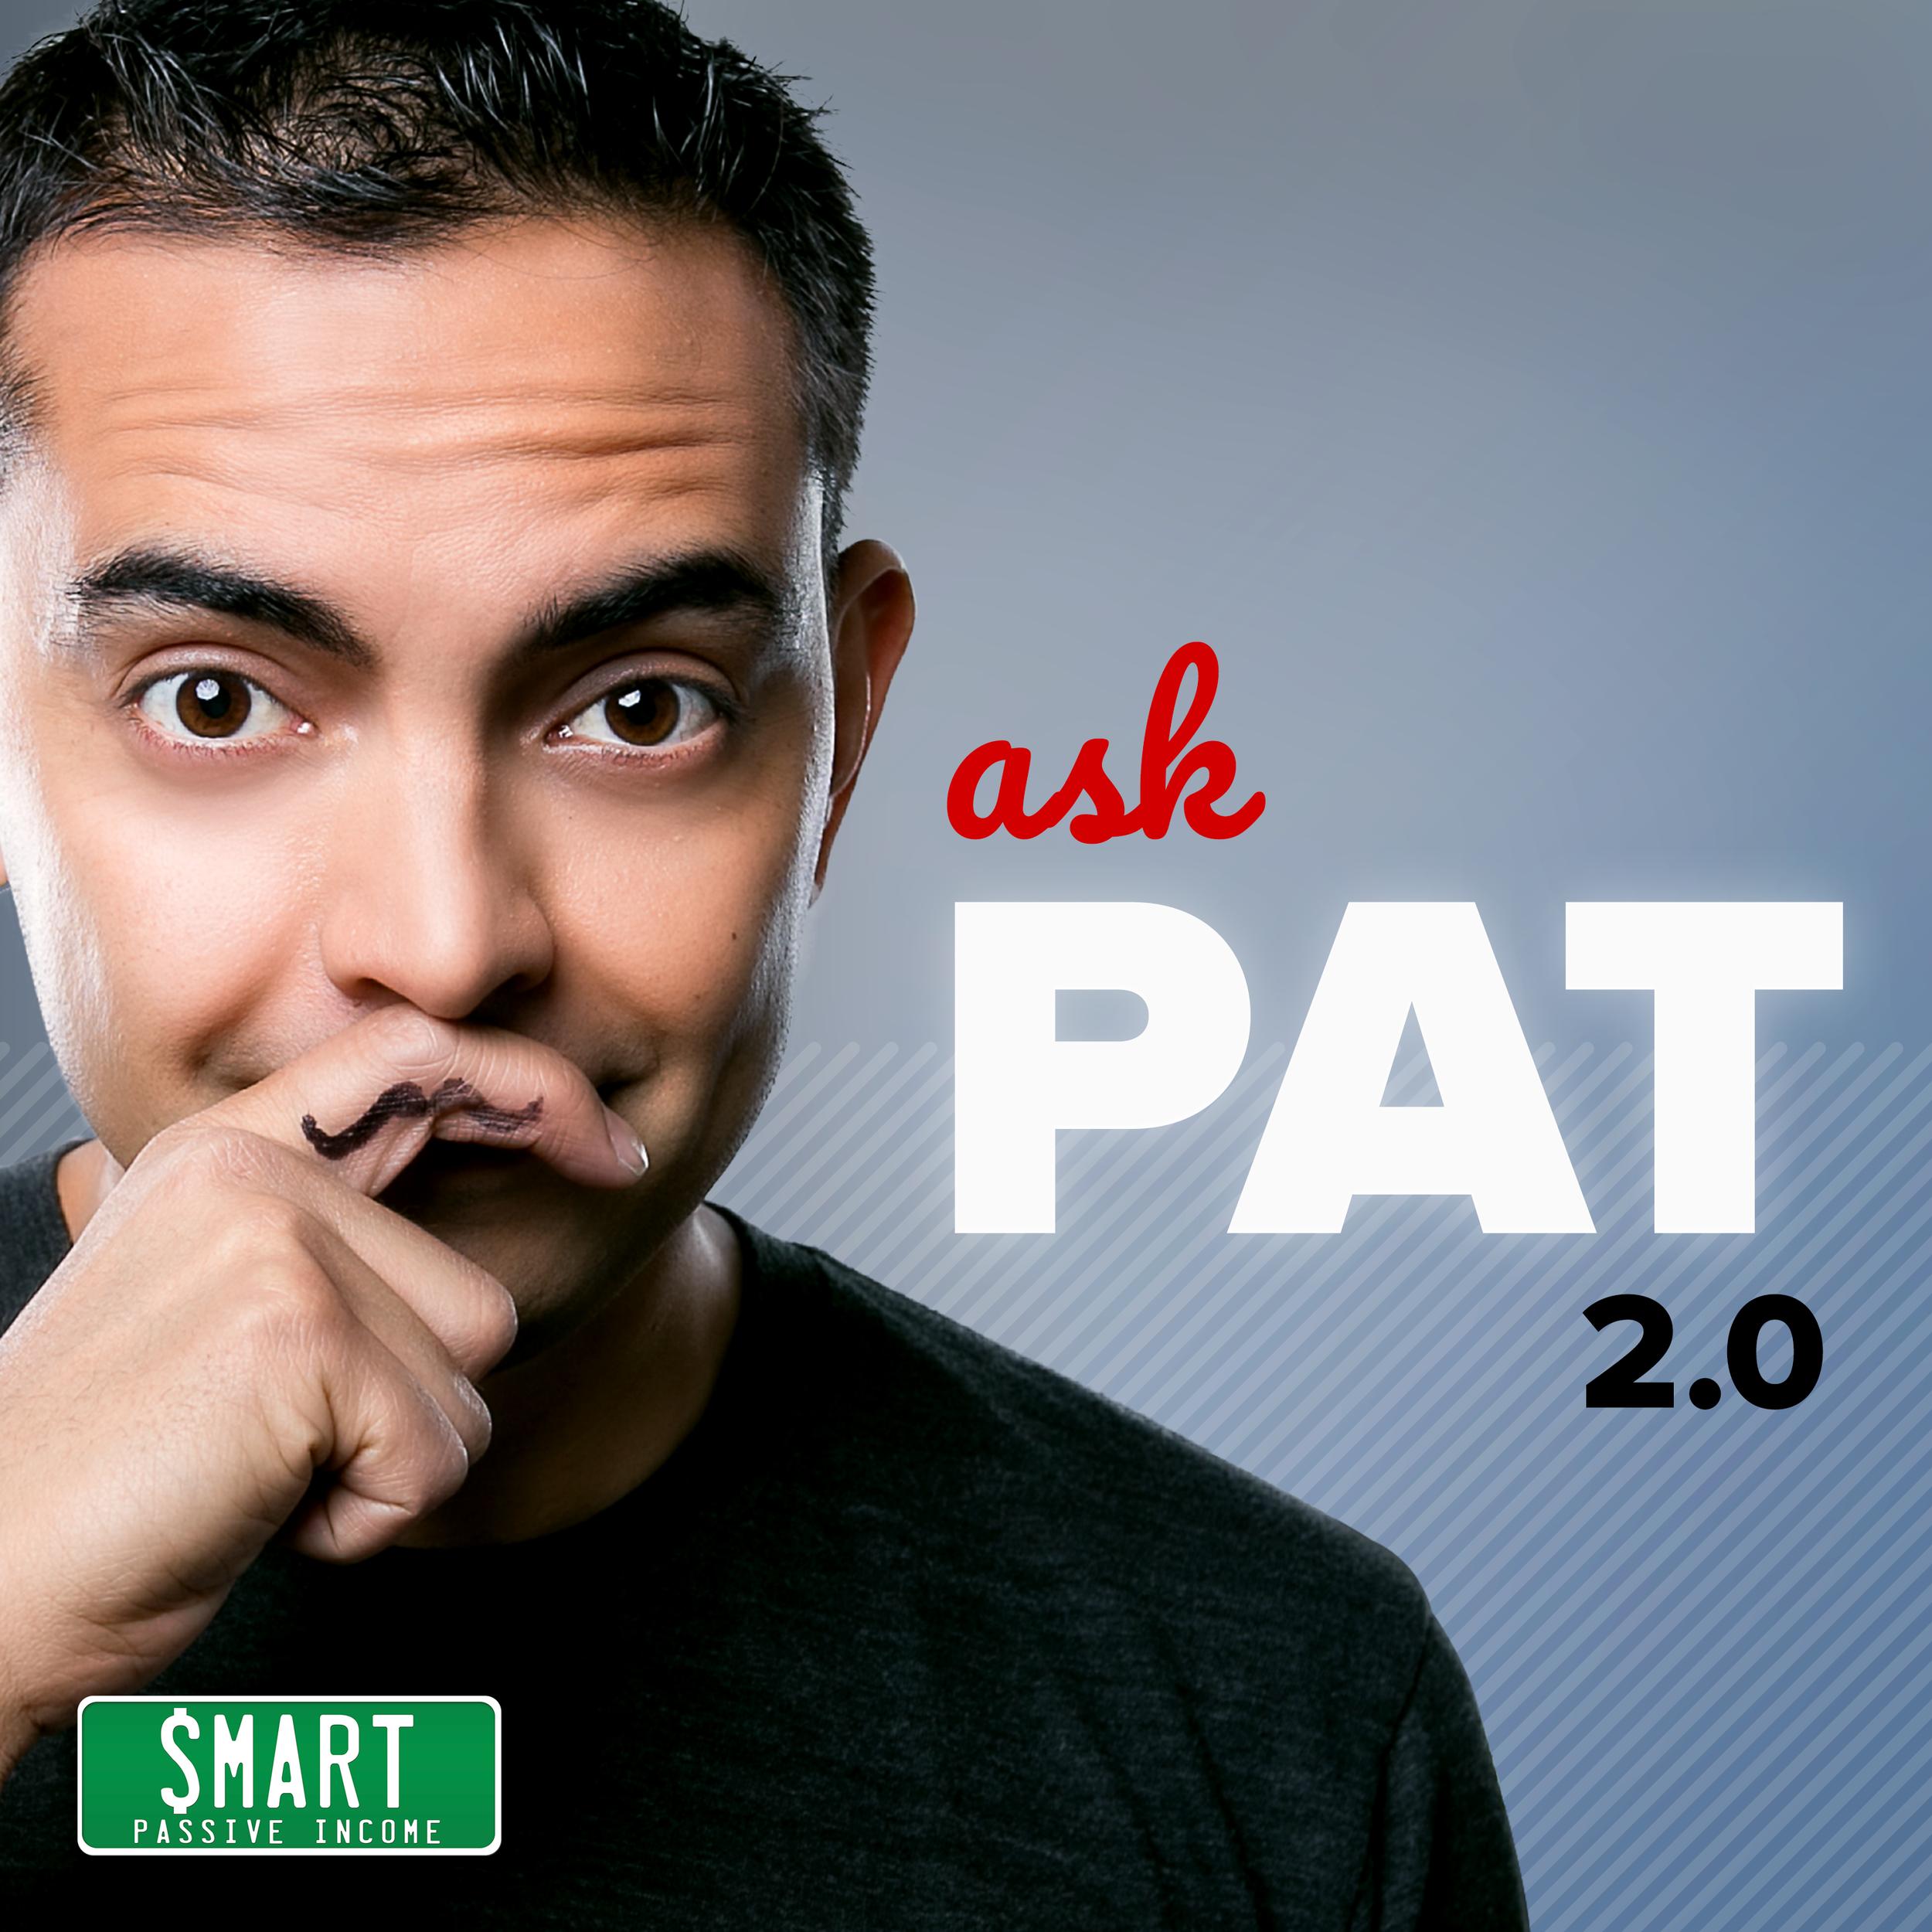 AskPat-2-Logo-HighRes (1).png